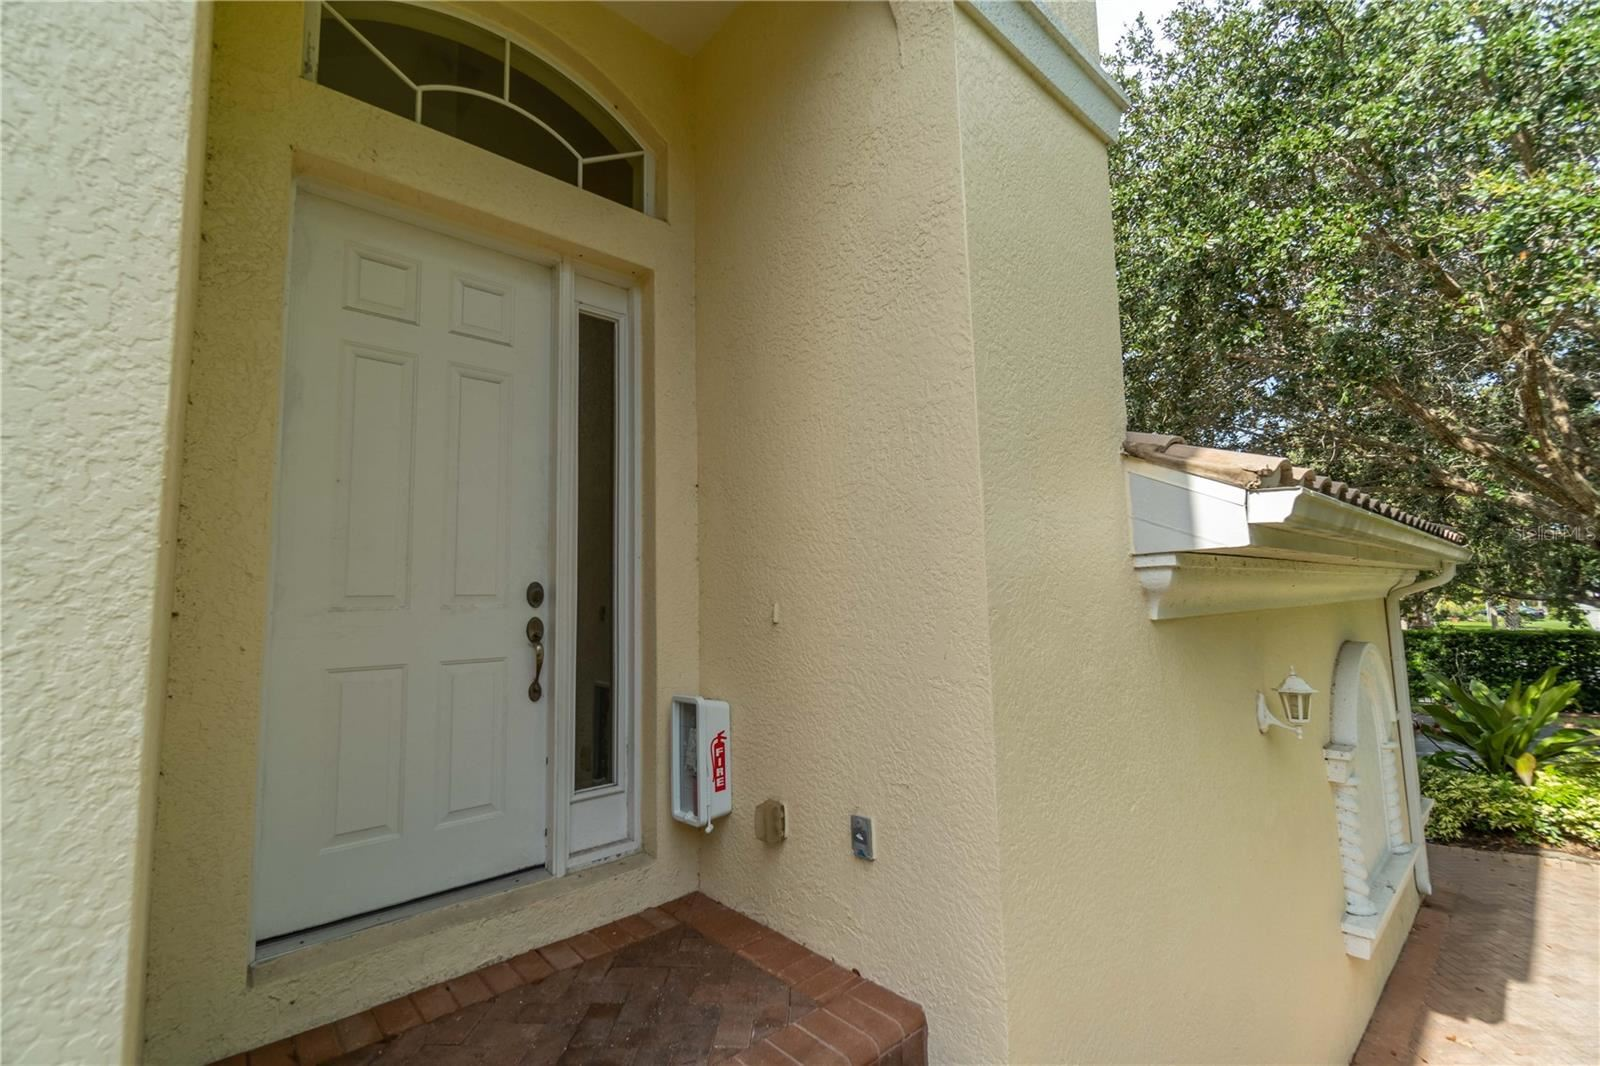 Photo of 1708 TRIANO CIRCLE #1708, VENICE, FL 34292 (MLS # N6116986)